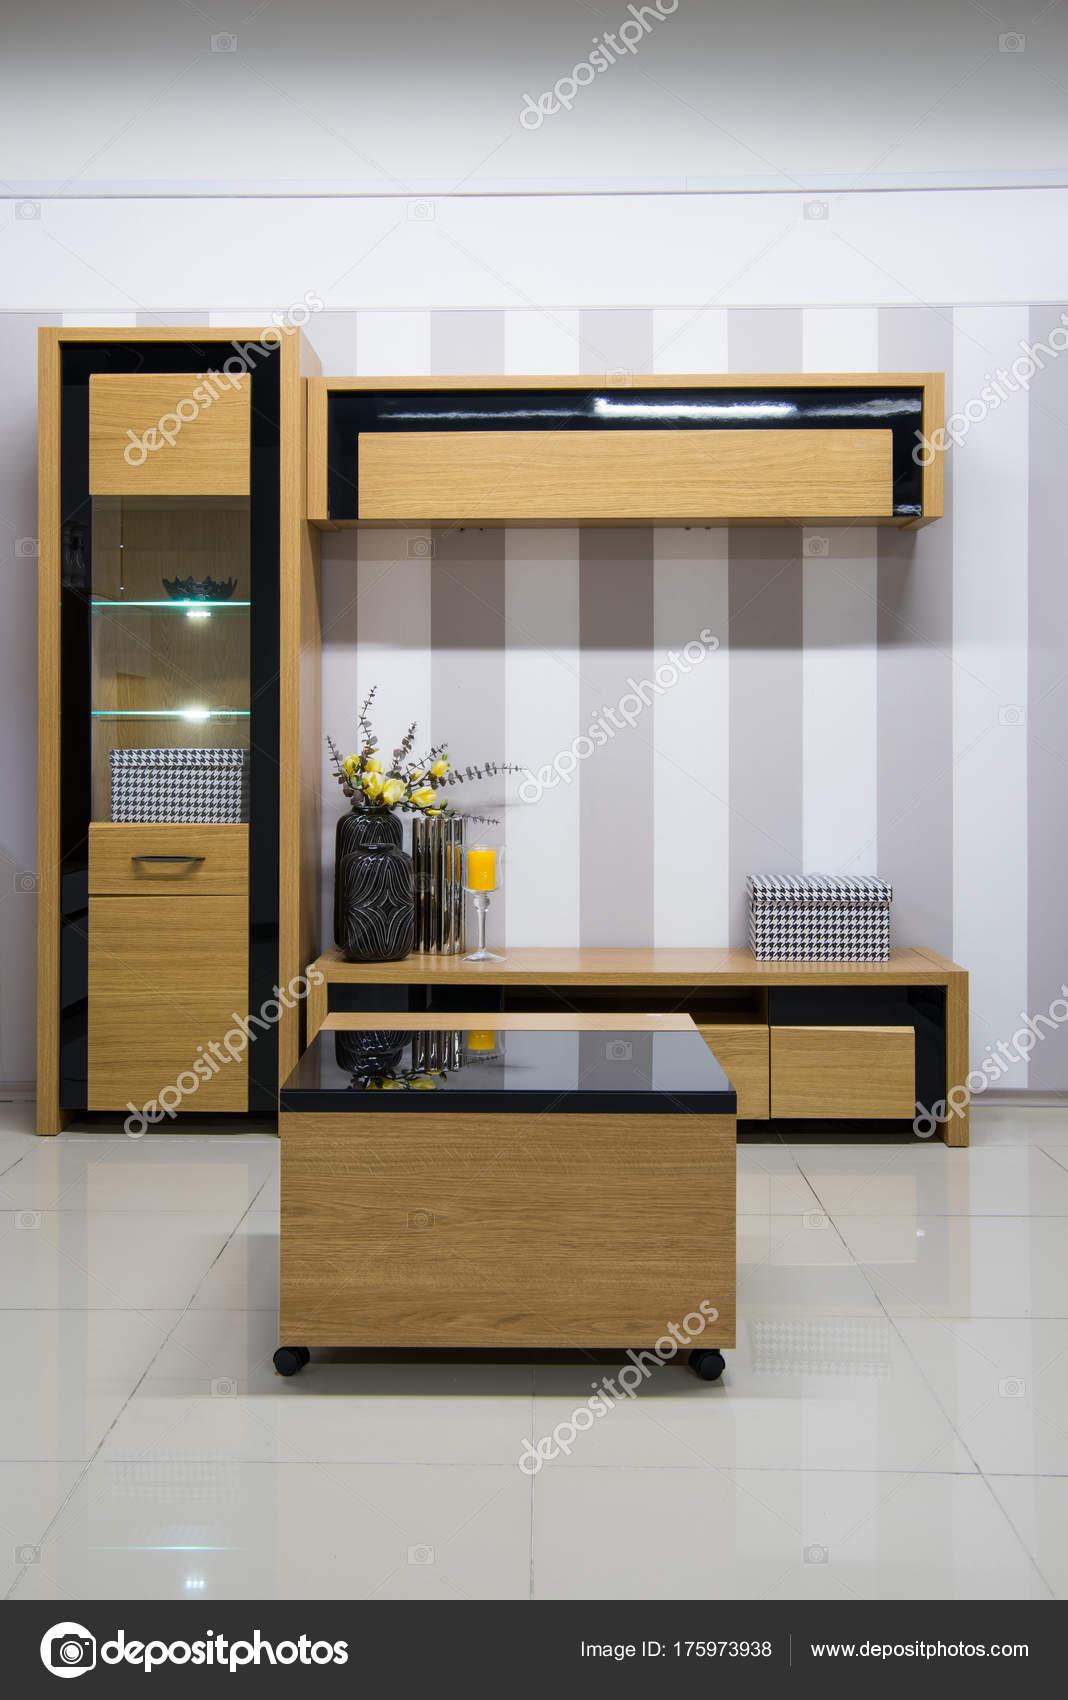 https://st3.depositphotos.com/13194036/17597/i/1600/depositphotos_175973938-stockafbeelding-moderne-woonkamer-interieur-met-kast.jpg